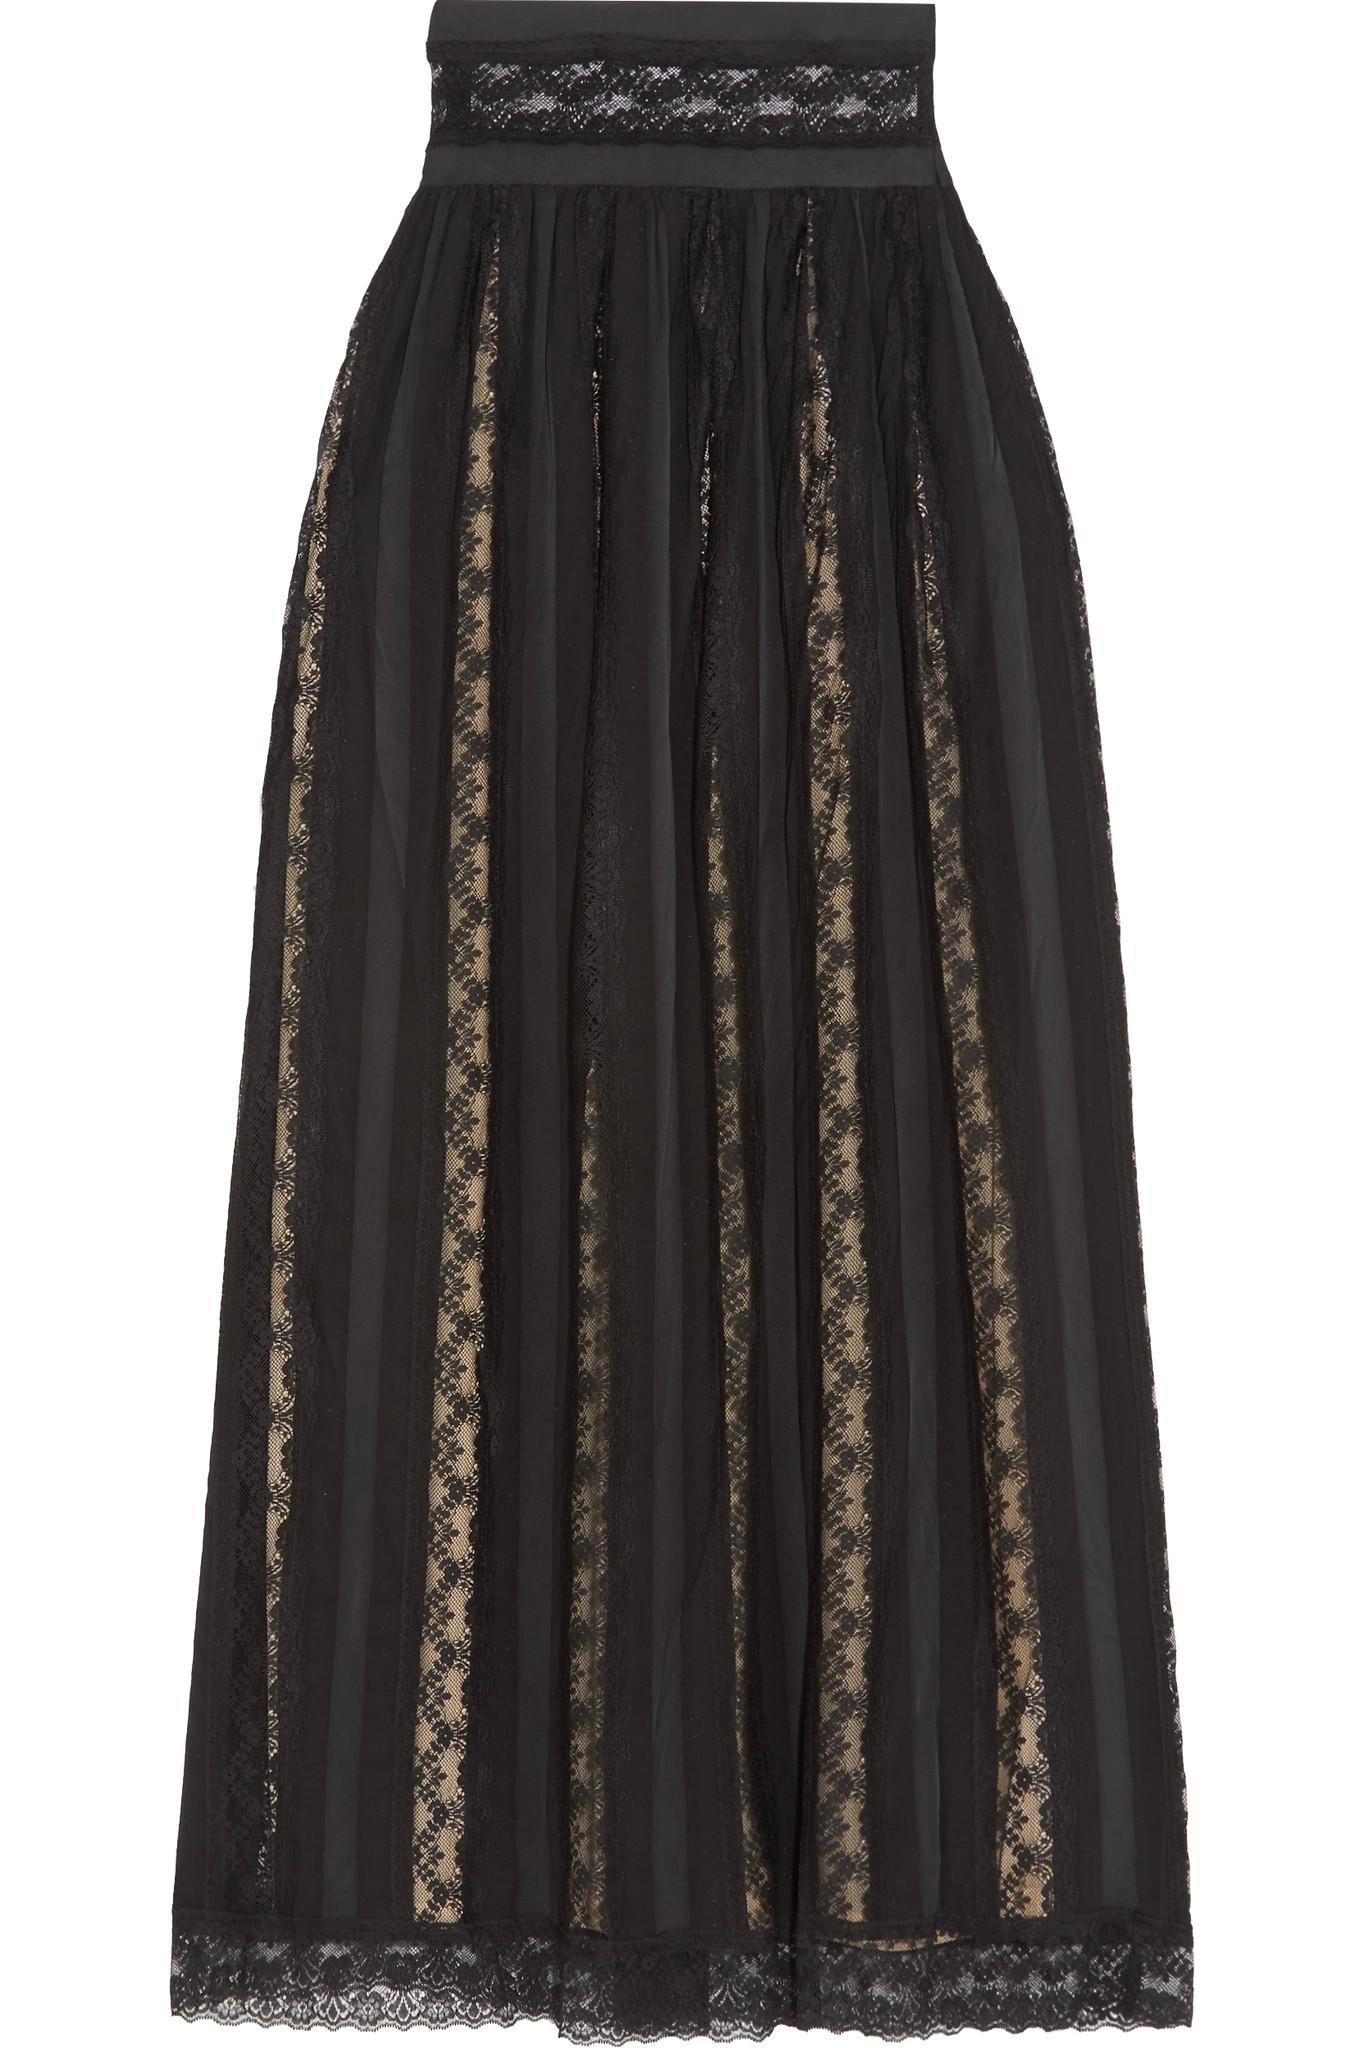 Wiki Sale Online Collections Cheap Price Lace And Chiffon Maxi Skirt - Black Balmain B9j9Qmn